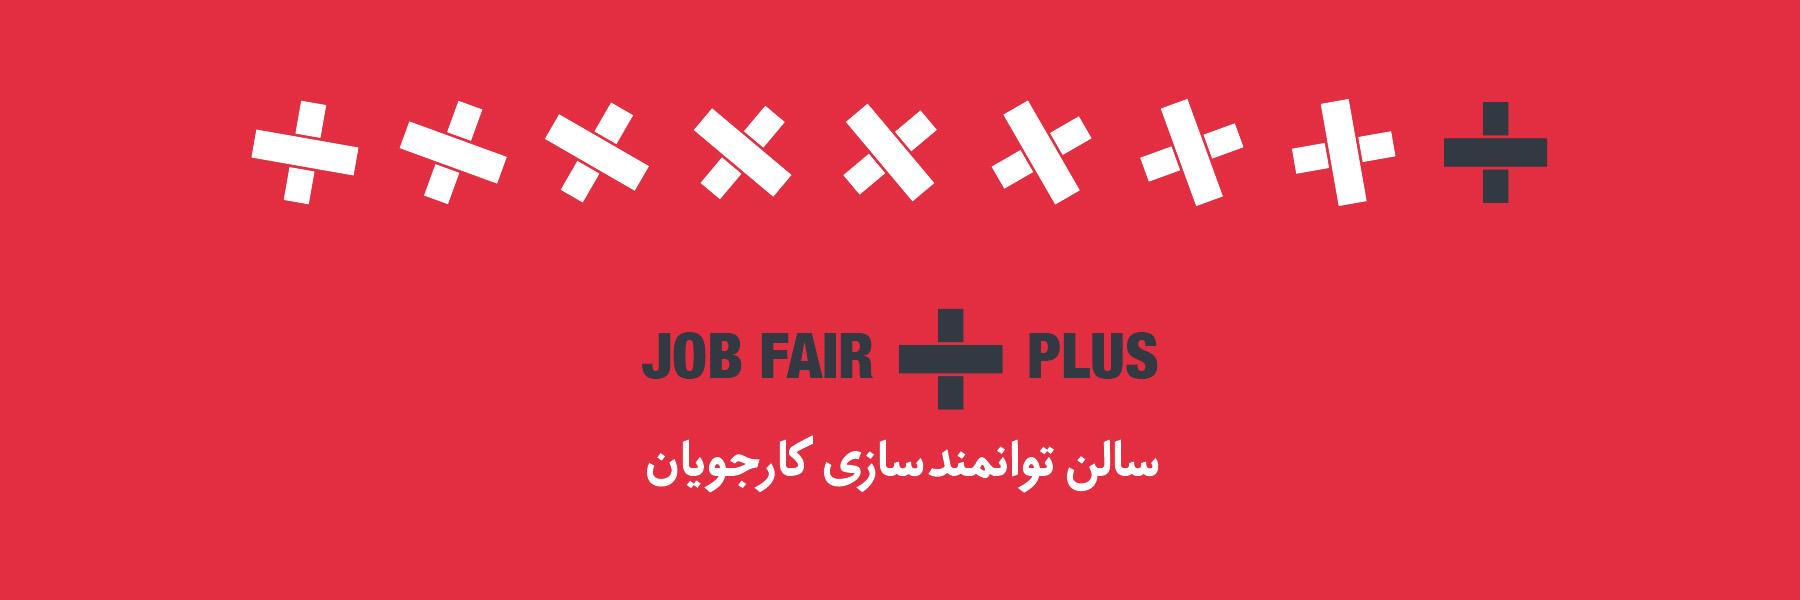 job fair plus